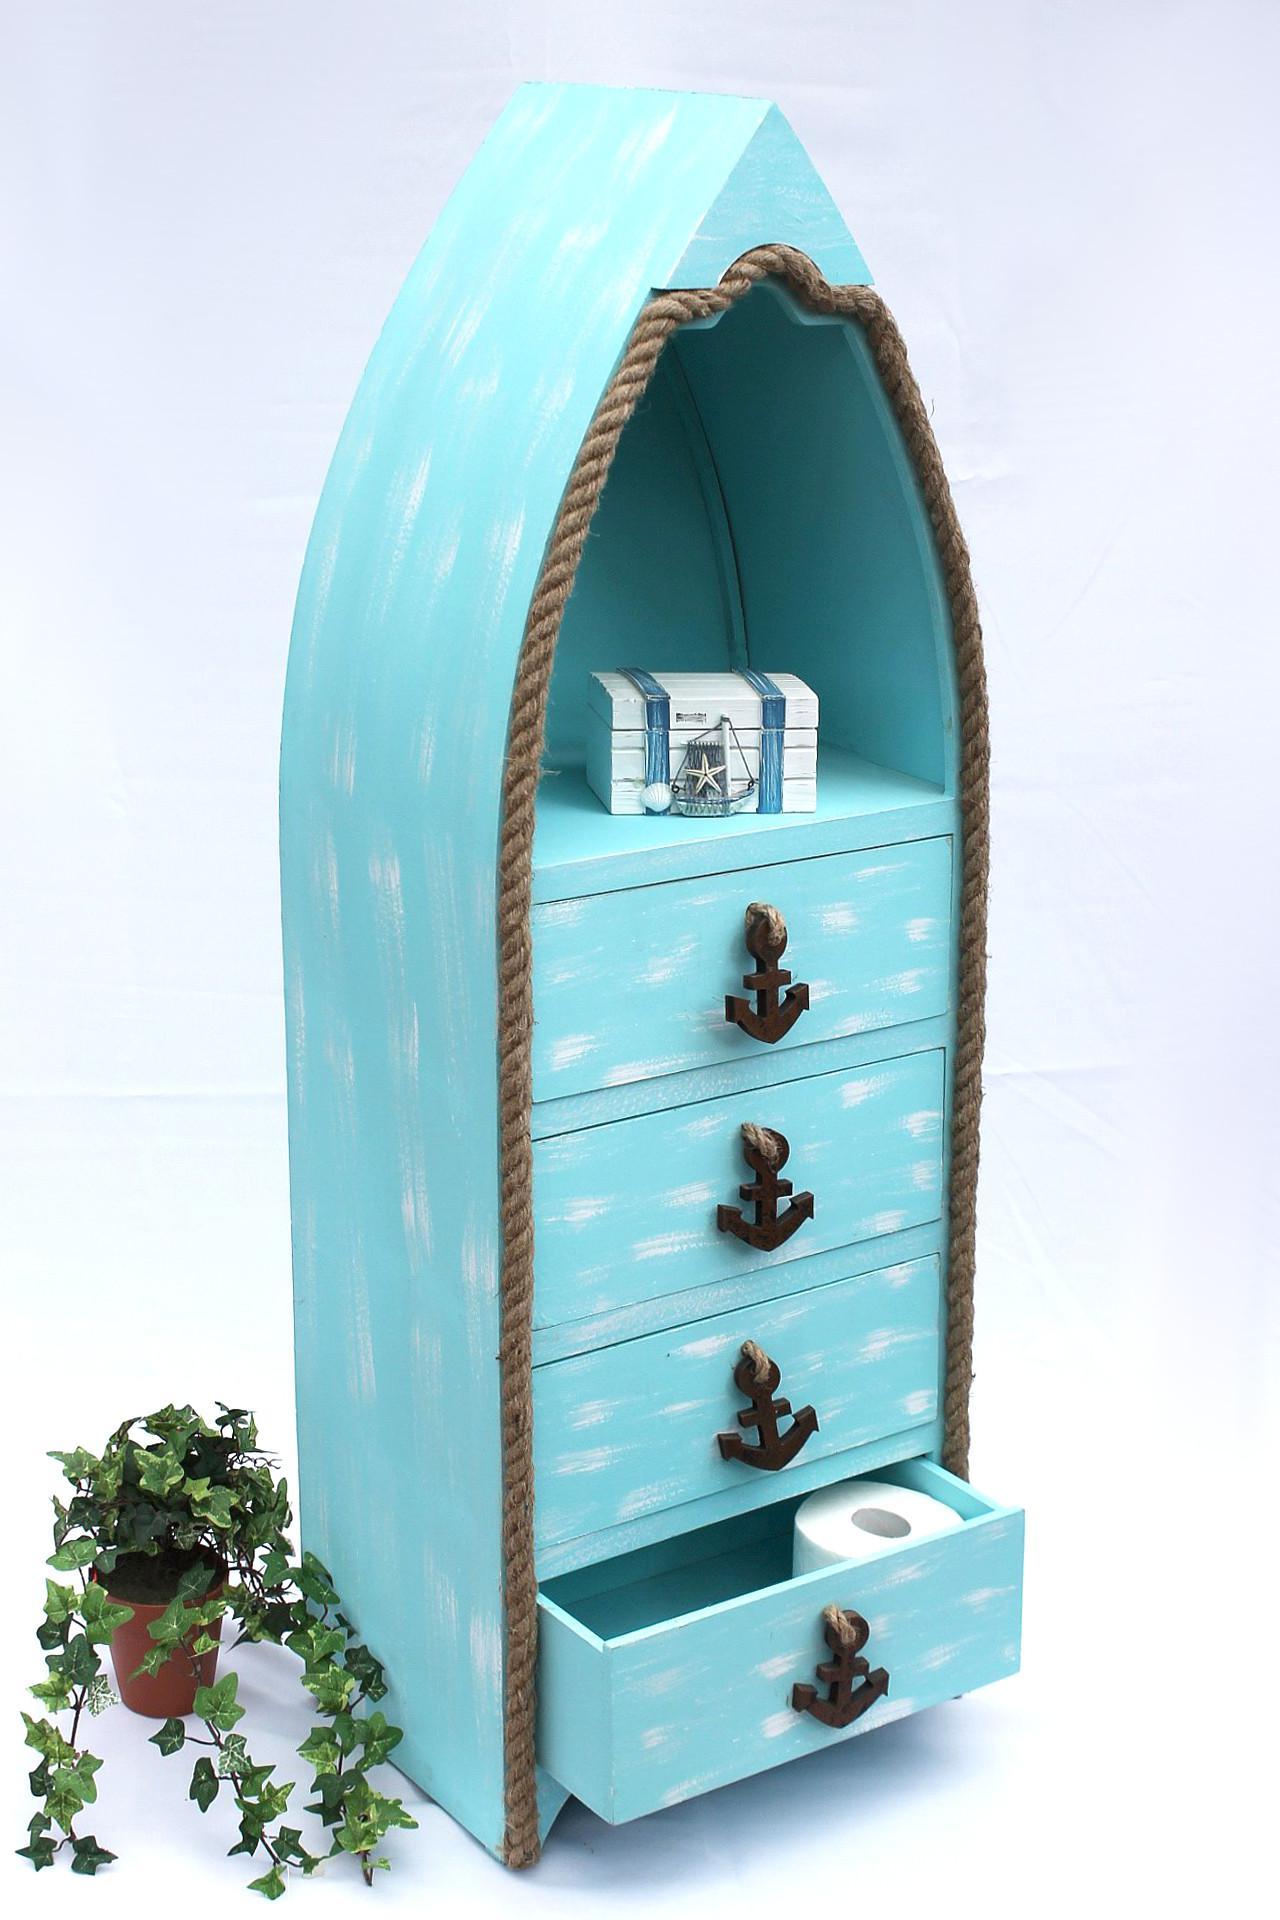 boot kommode 412 bl 117cm badregal blau shabby schrank badschrank badm bel regal kaufen bei. Black Bedroom Furniture Sets. Home Design Ideas